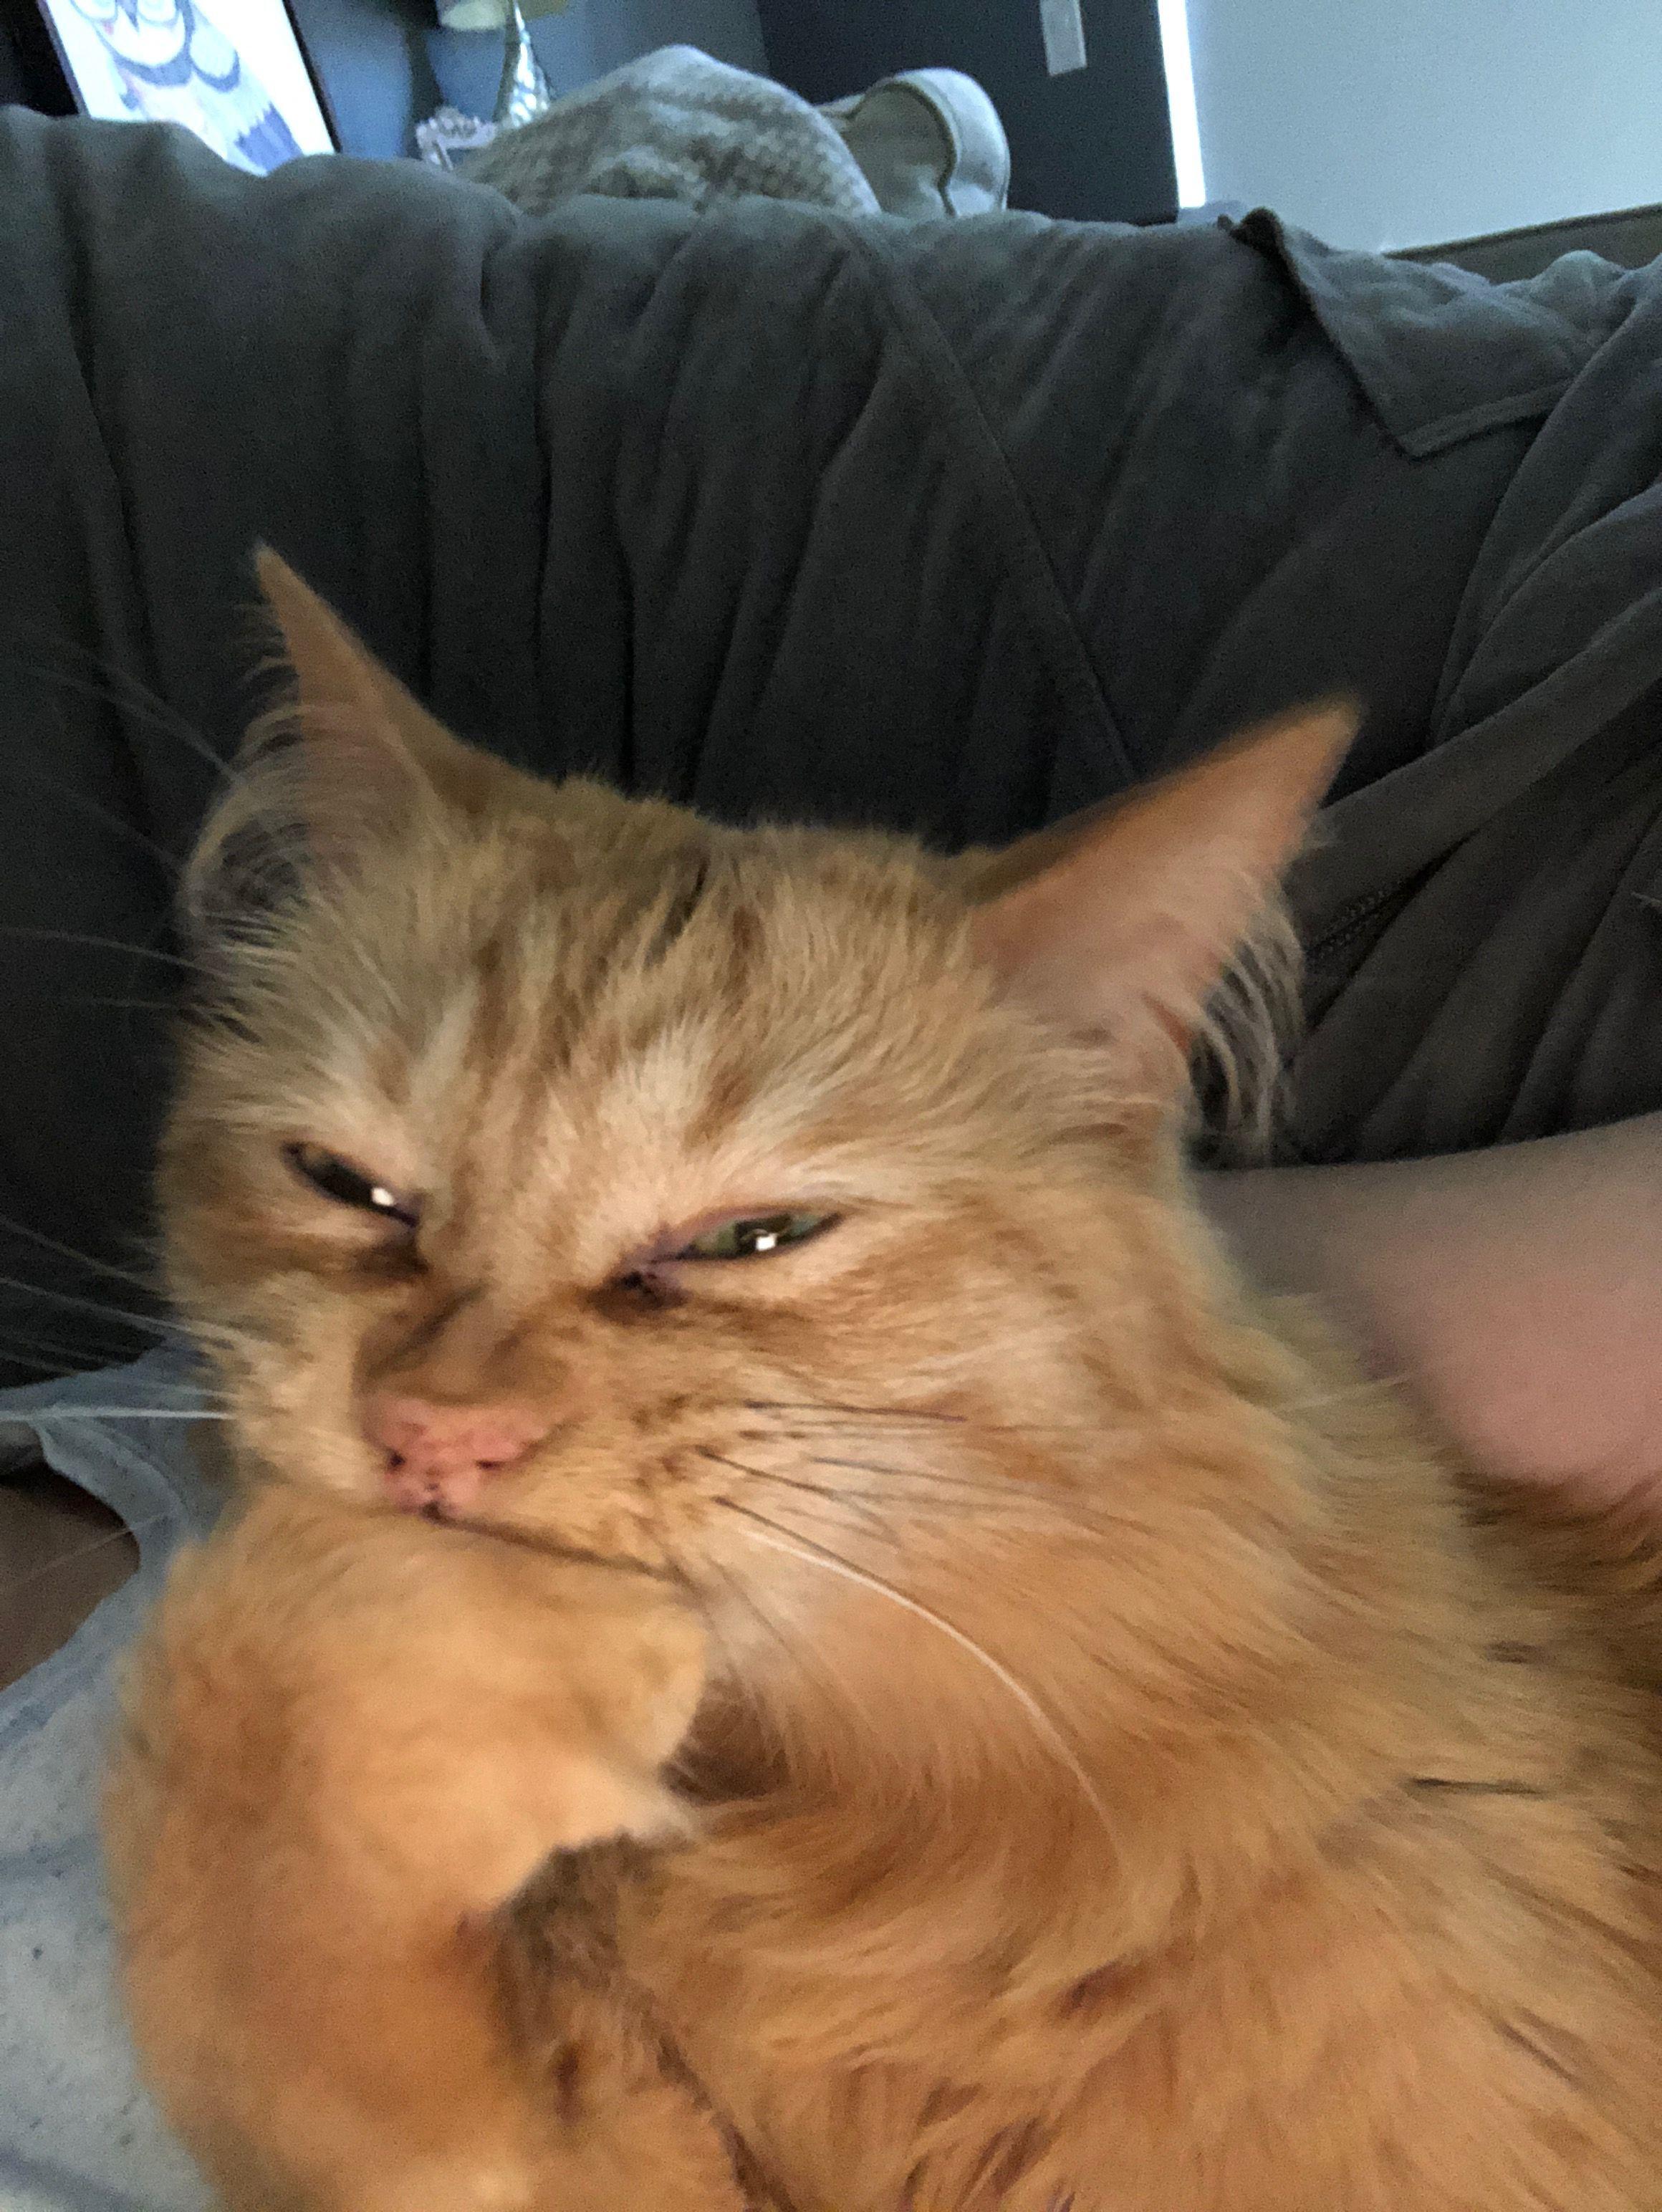 Pin by Susan Niedermeyer on Buddy the Amazing Orange Cat